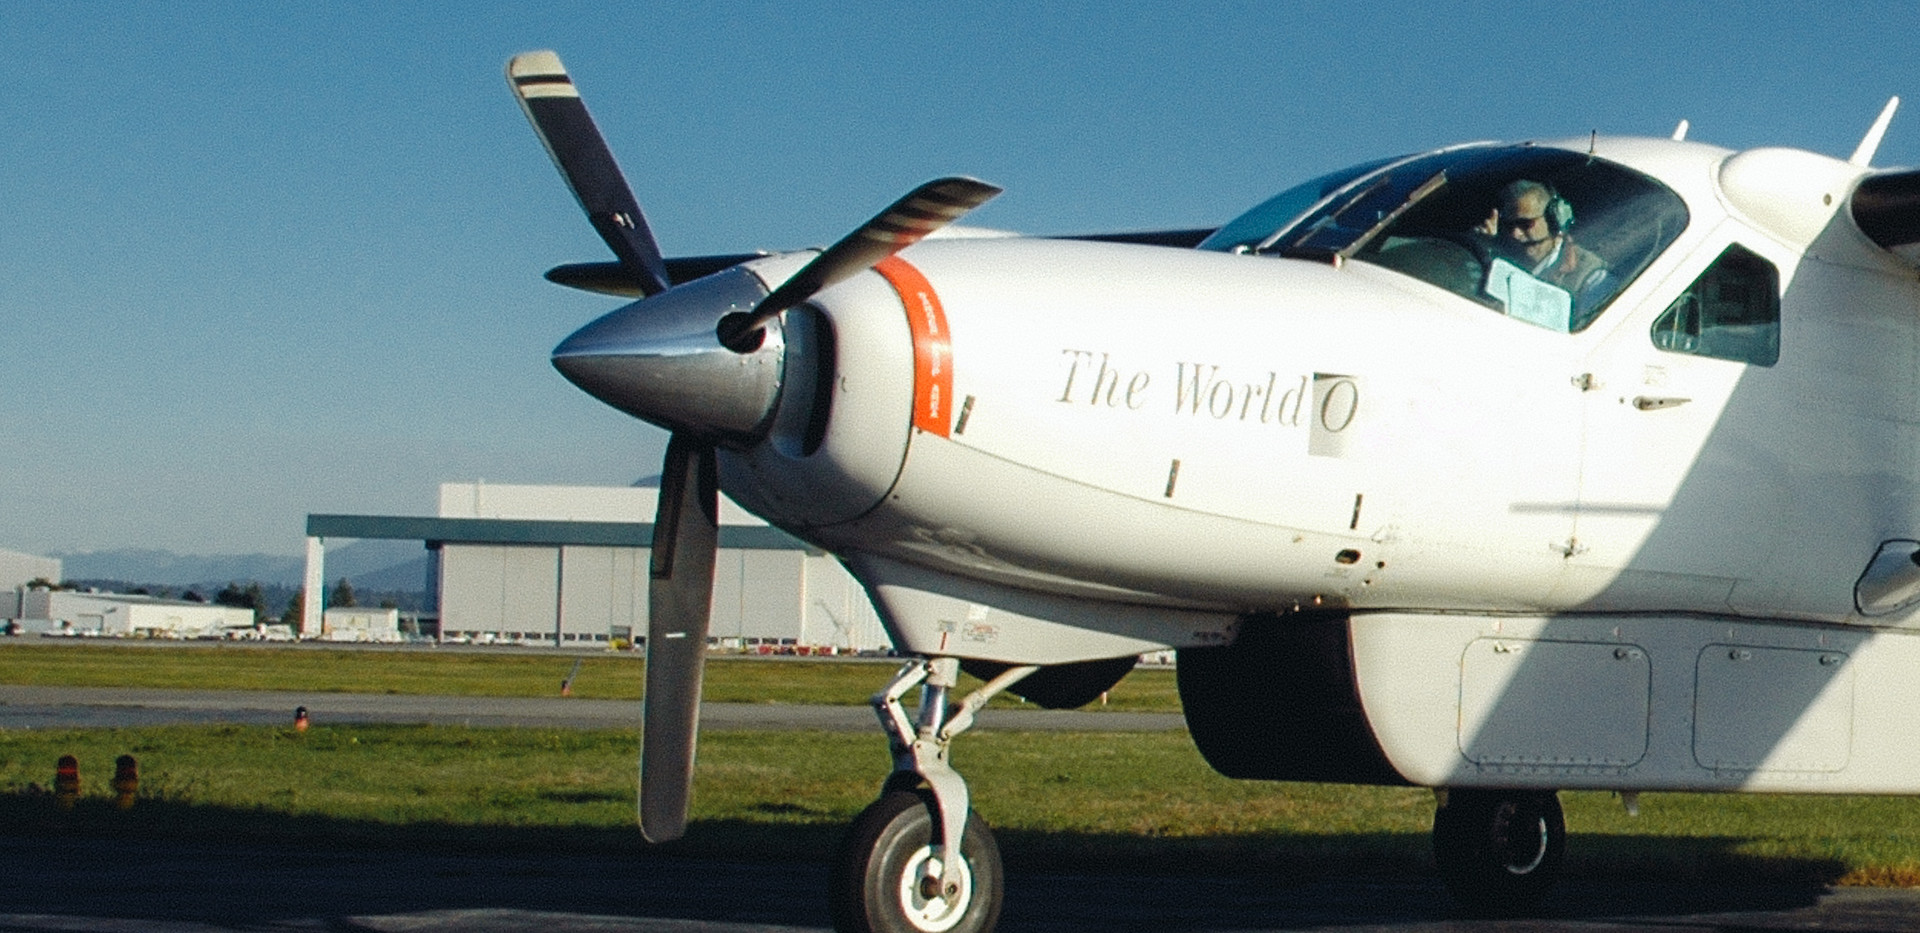 Western Propeller Capabilities C208 McCauley 3GFR34C703